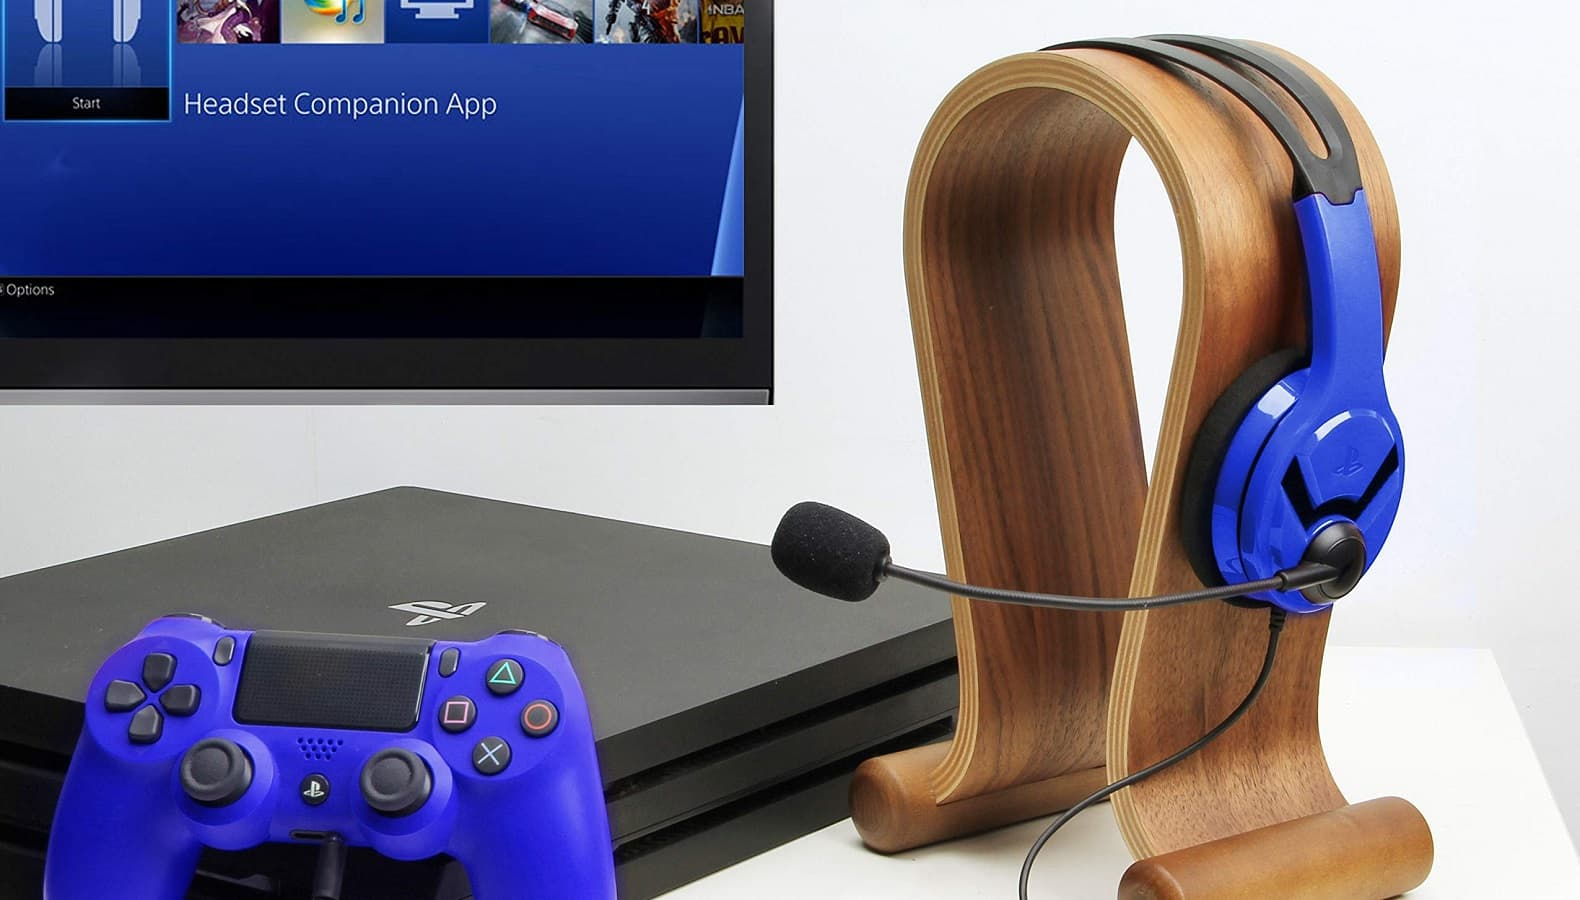 amazonbasics playstation 4 headset